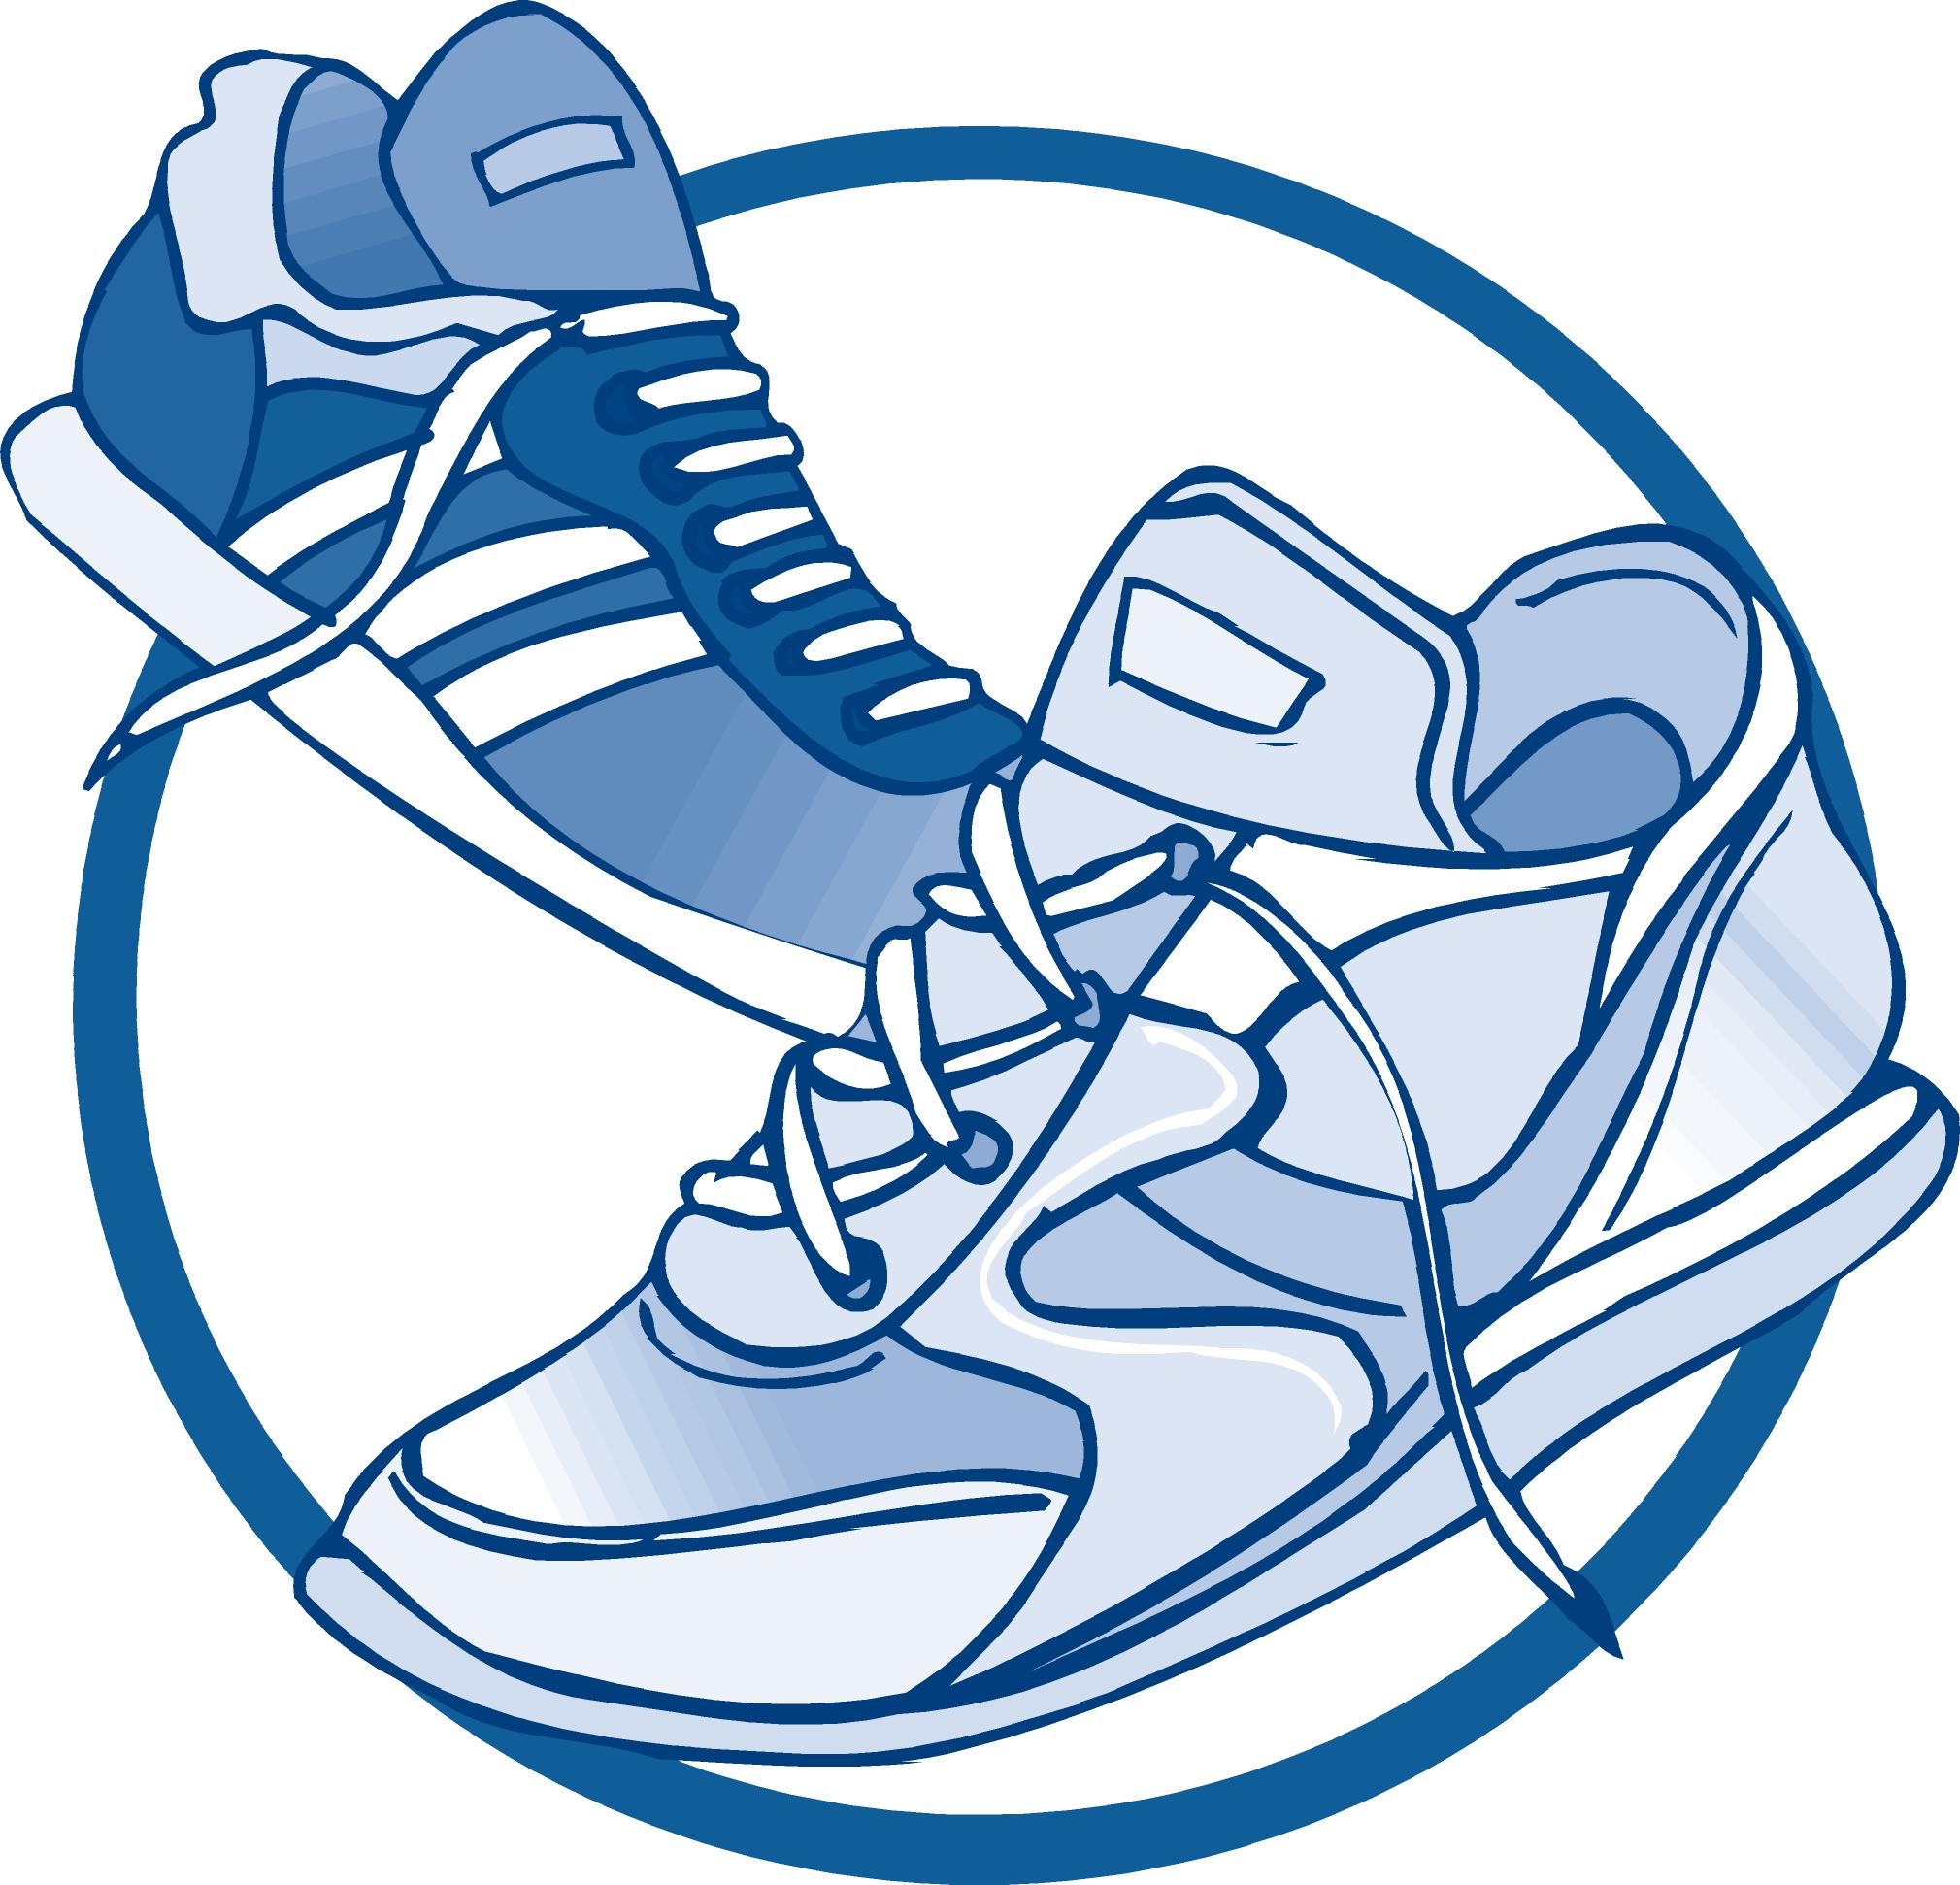 2019x1942 Tennis Shoe Clipart